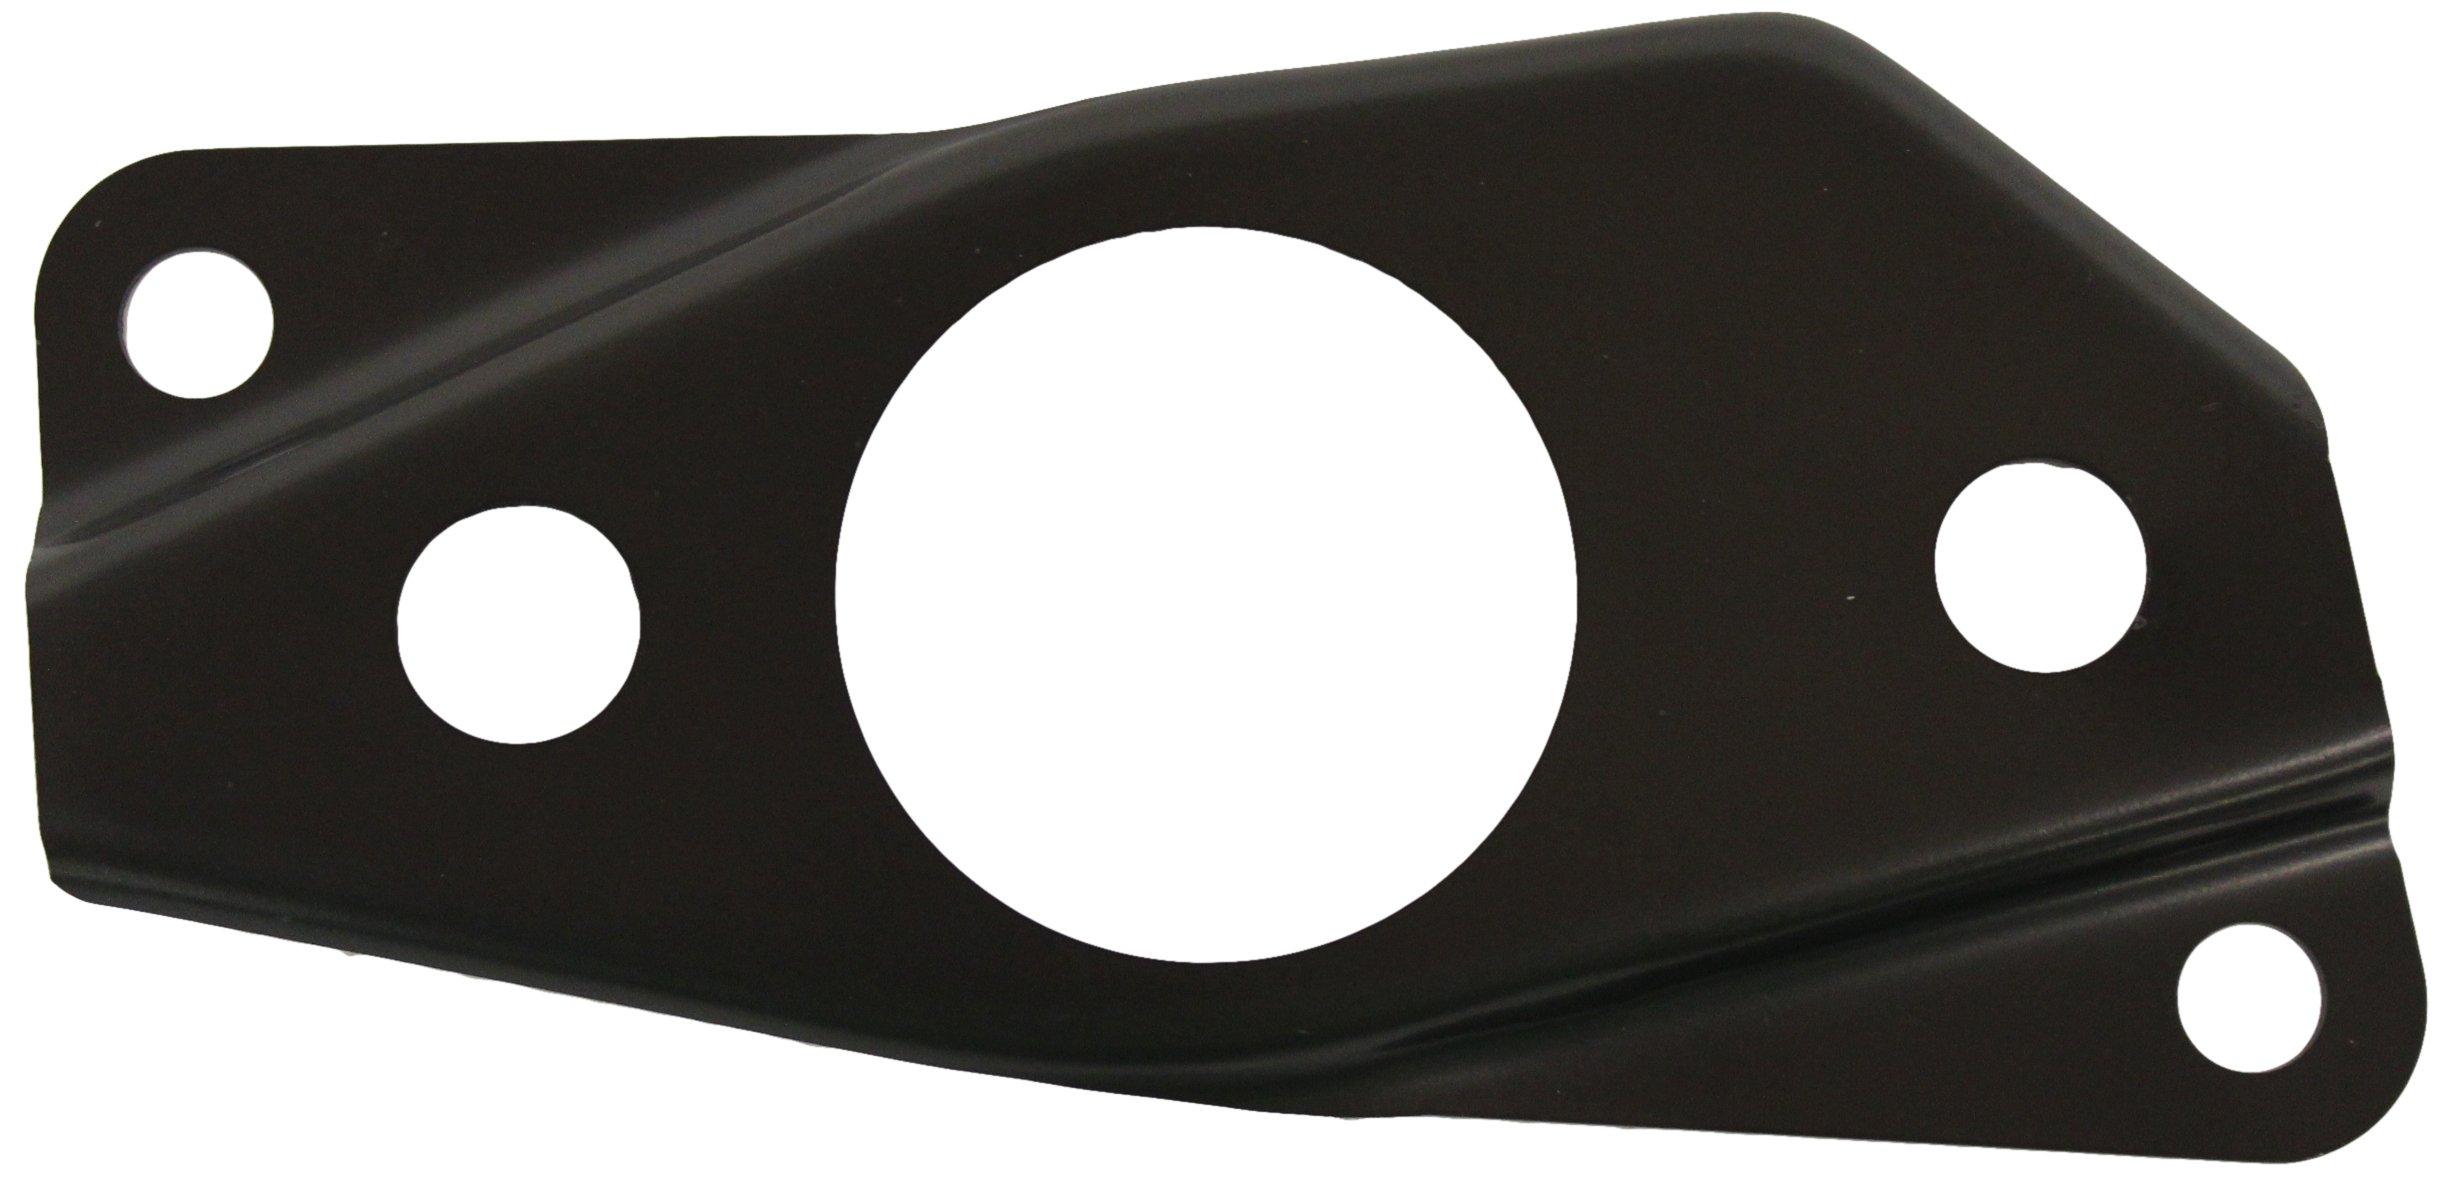 Genuine Toyota 55113-34010 Clutch Pedal Plate